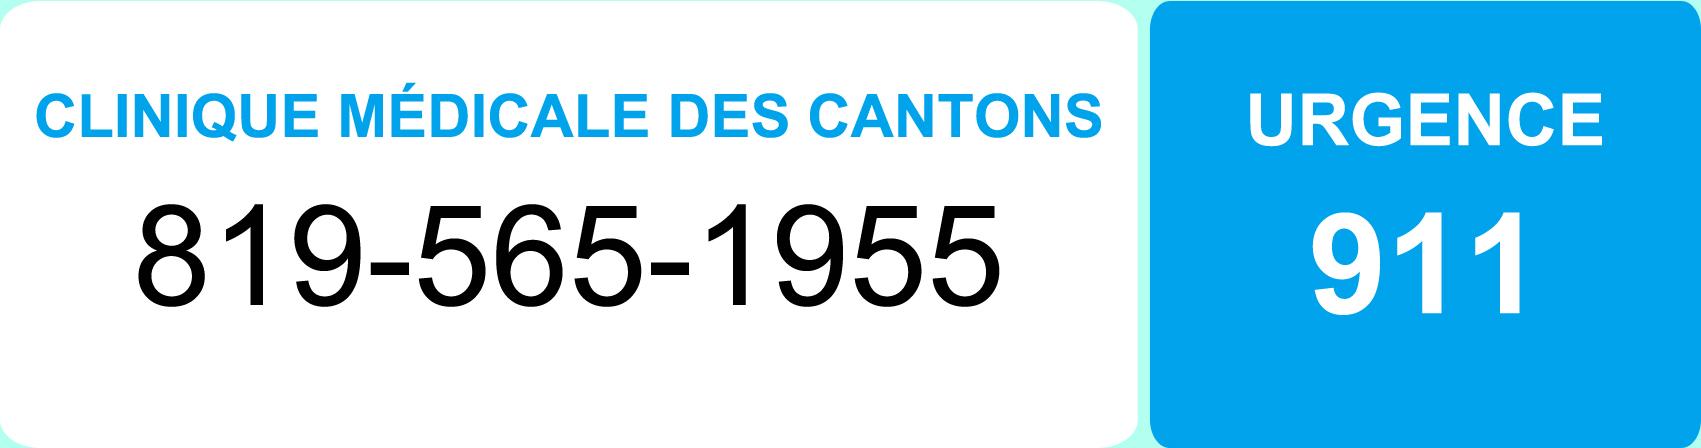 téléphone : 819-565-1955